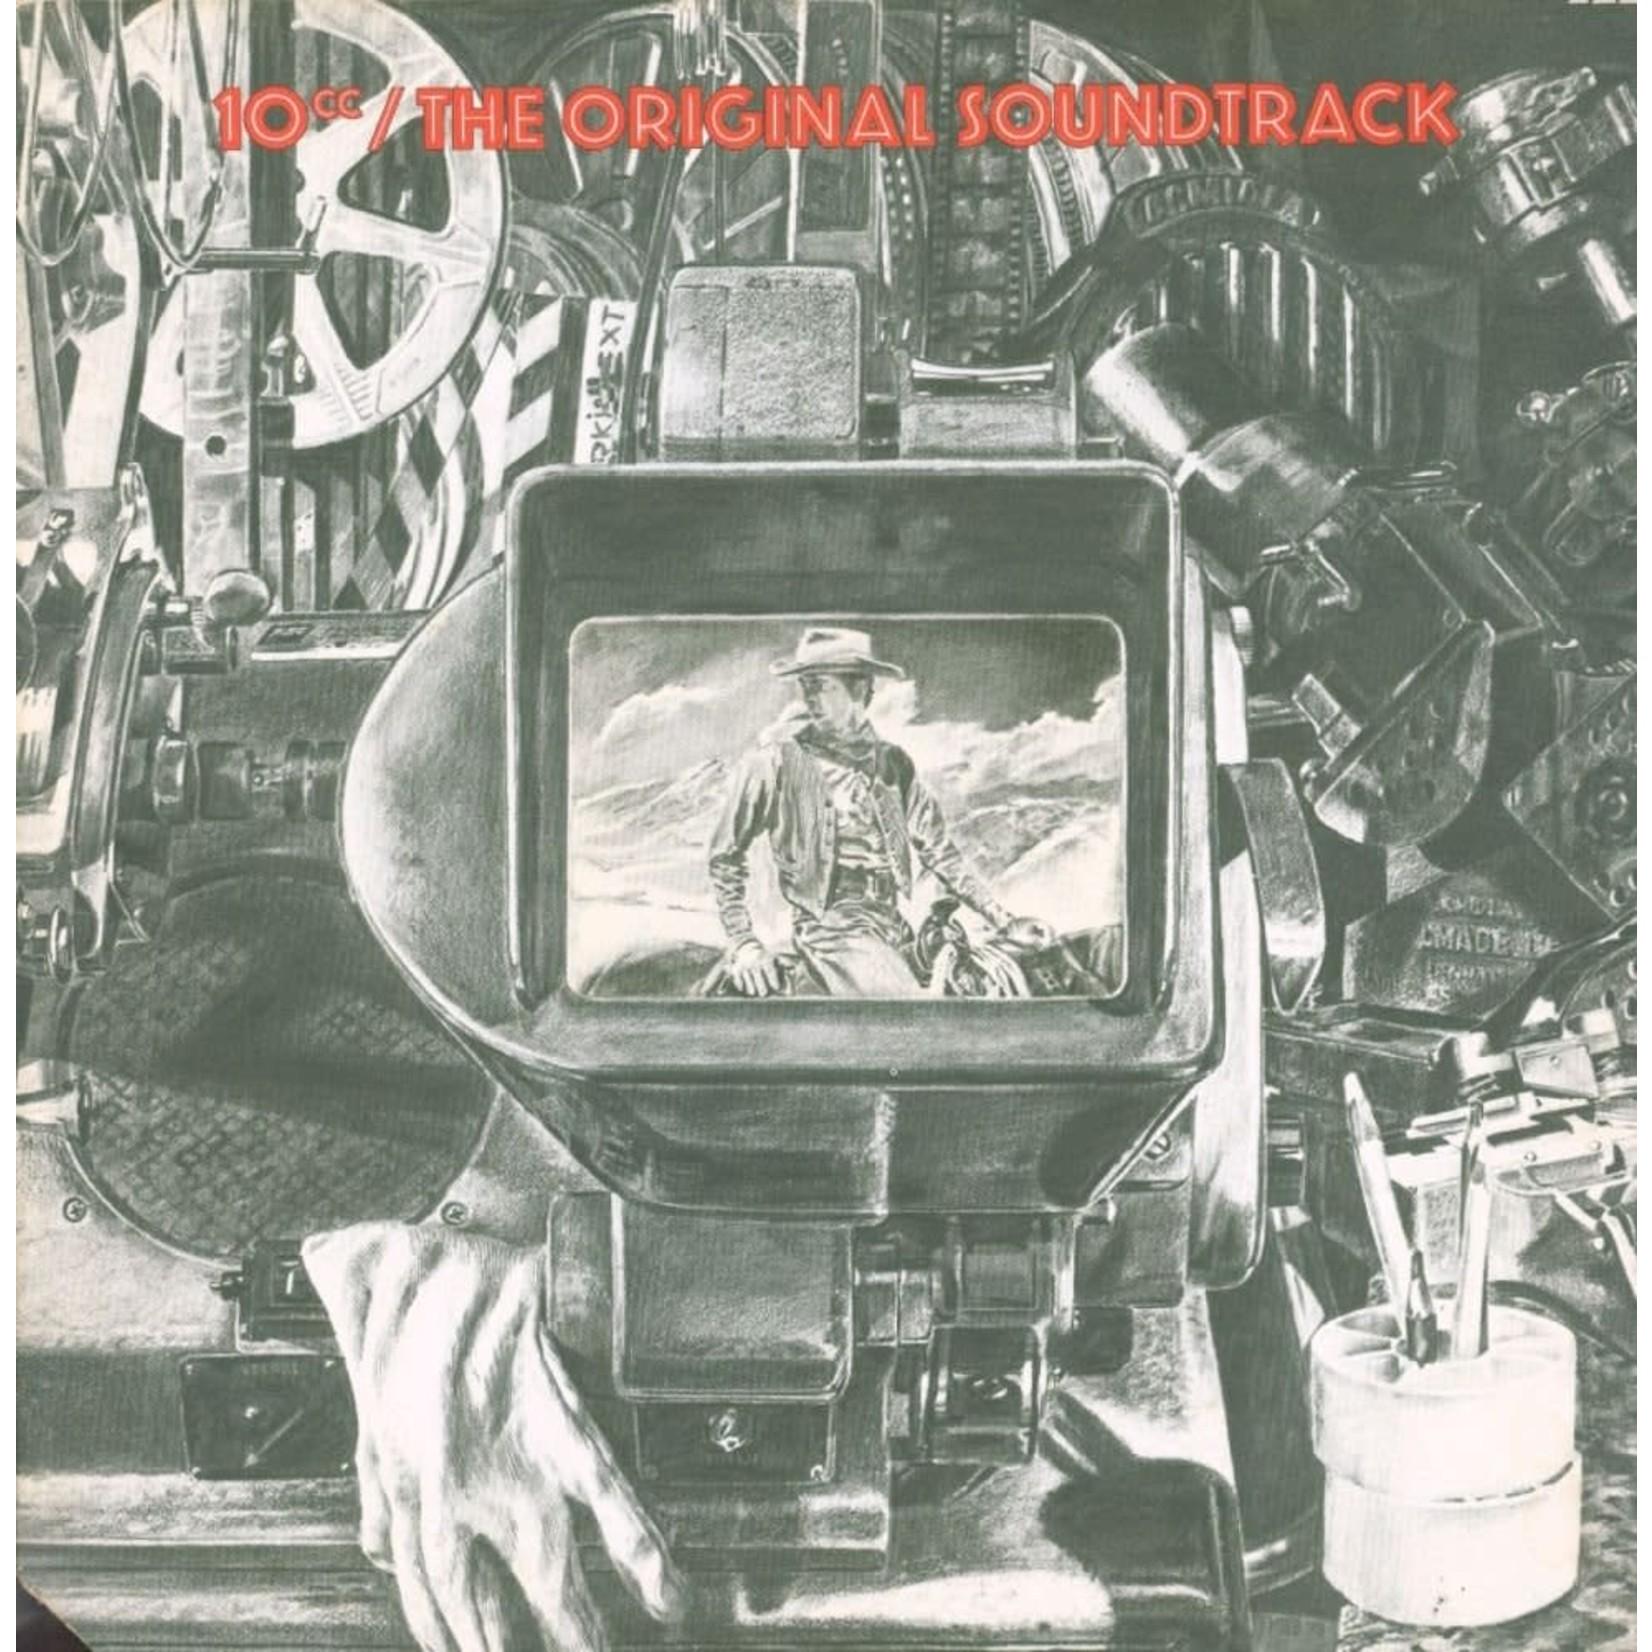 [Vintage] 10cc: Original Soundtrack